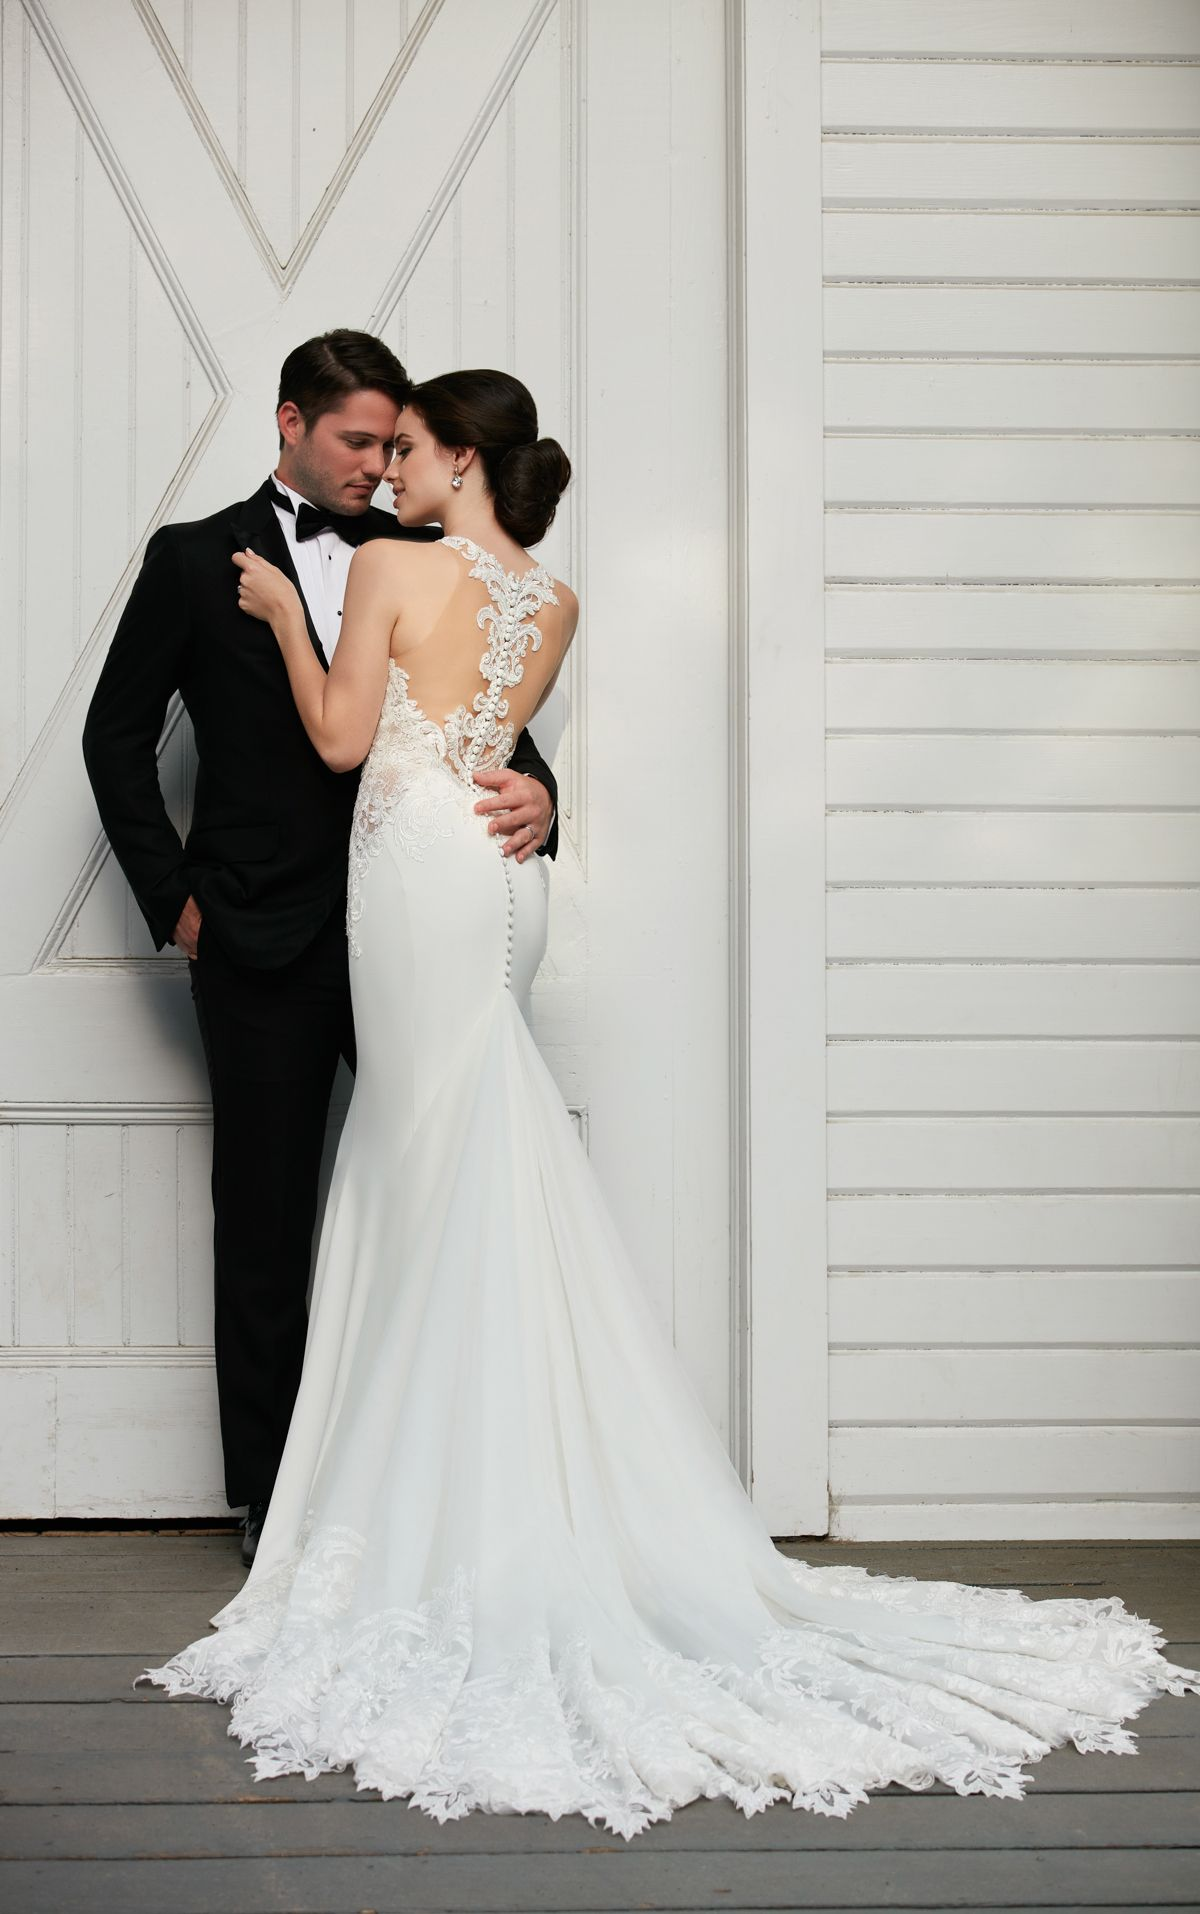 Illusion Racerback Wedding Dress with High Neck | Wedding dress and ...